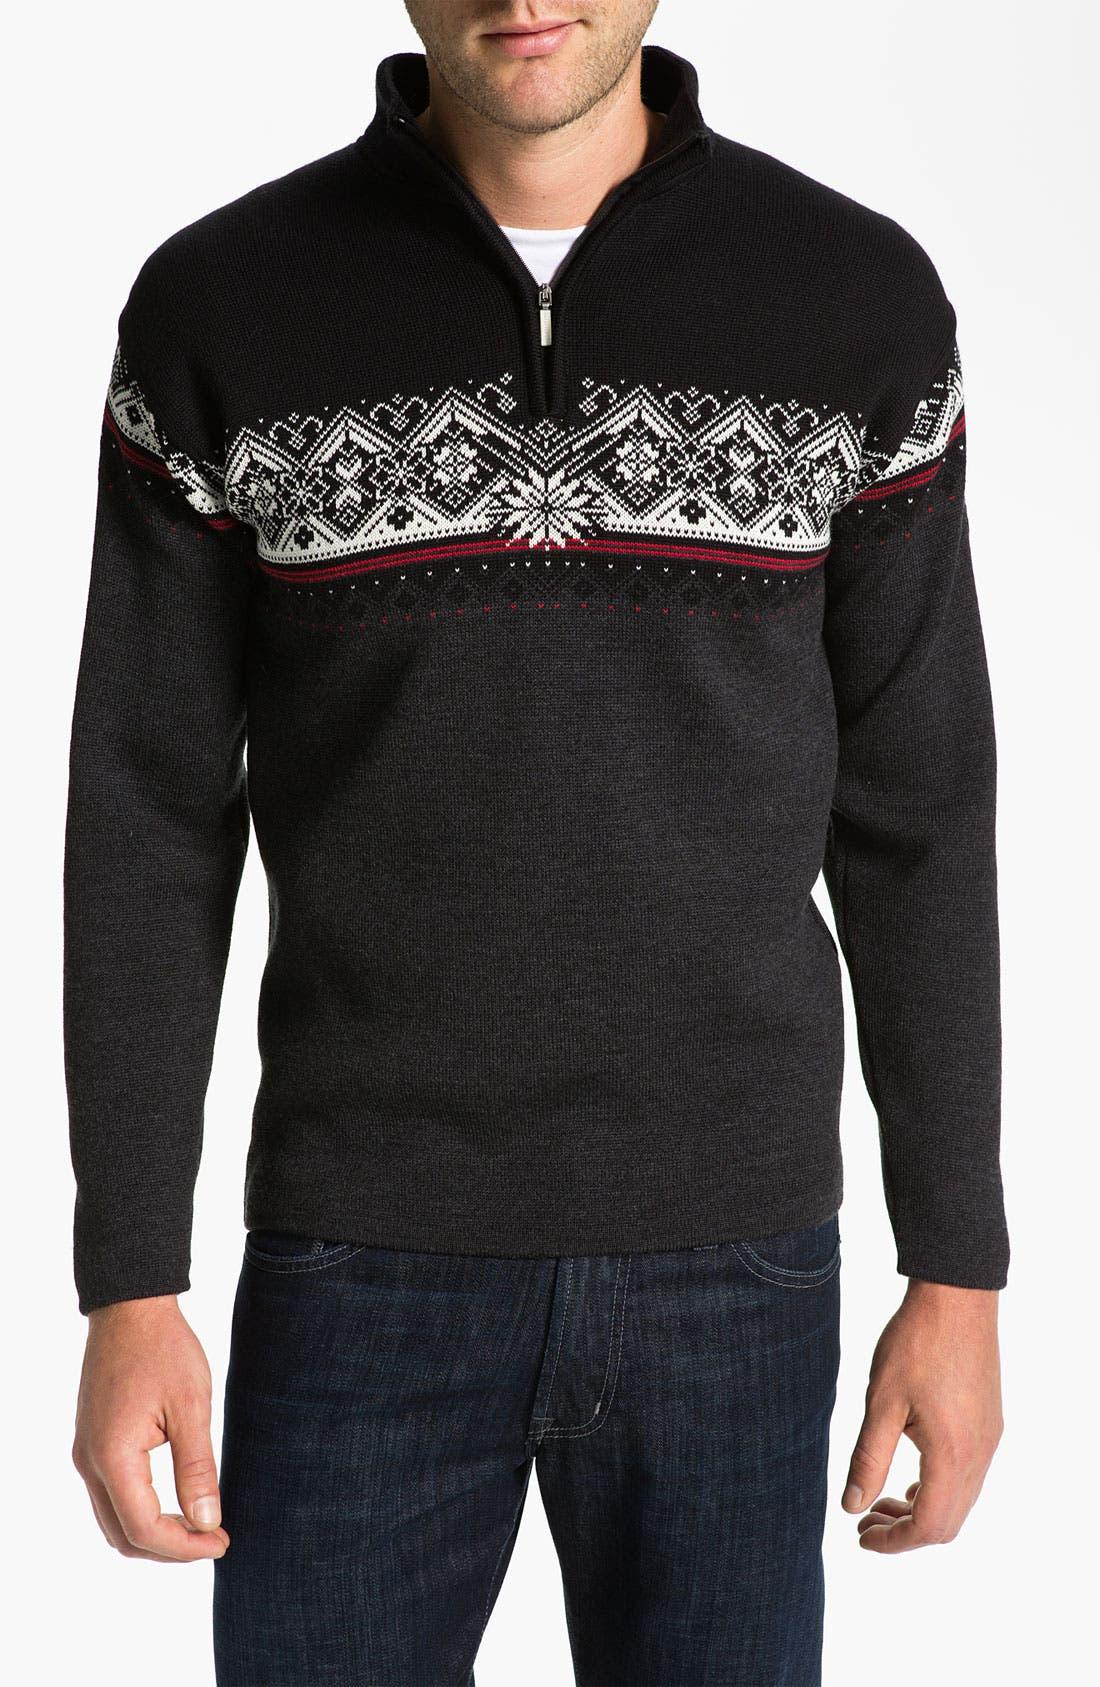 Main Image - Dale of Norway 'St Moritz' Quarter Zip Merino Wool Sweater